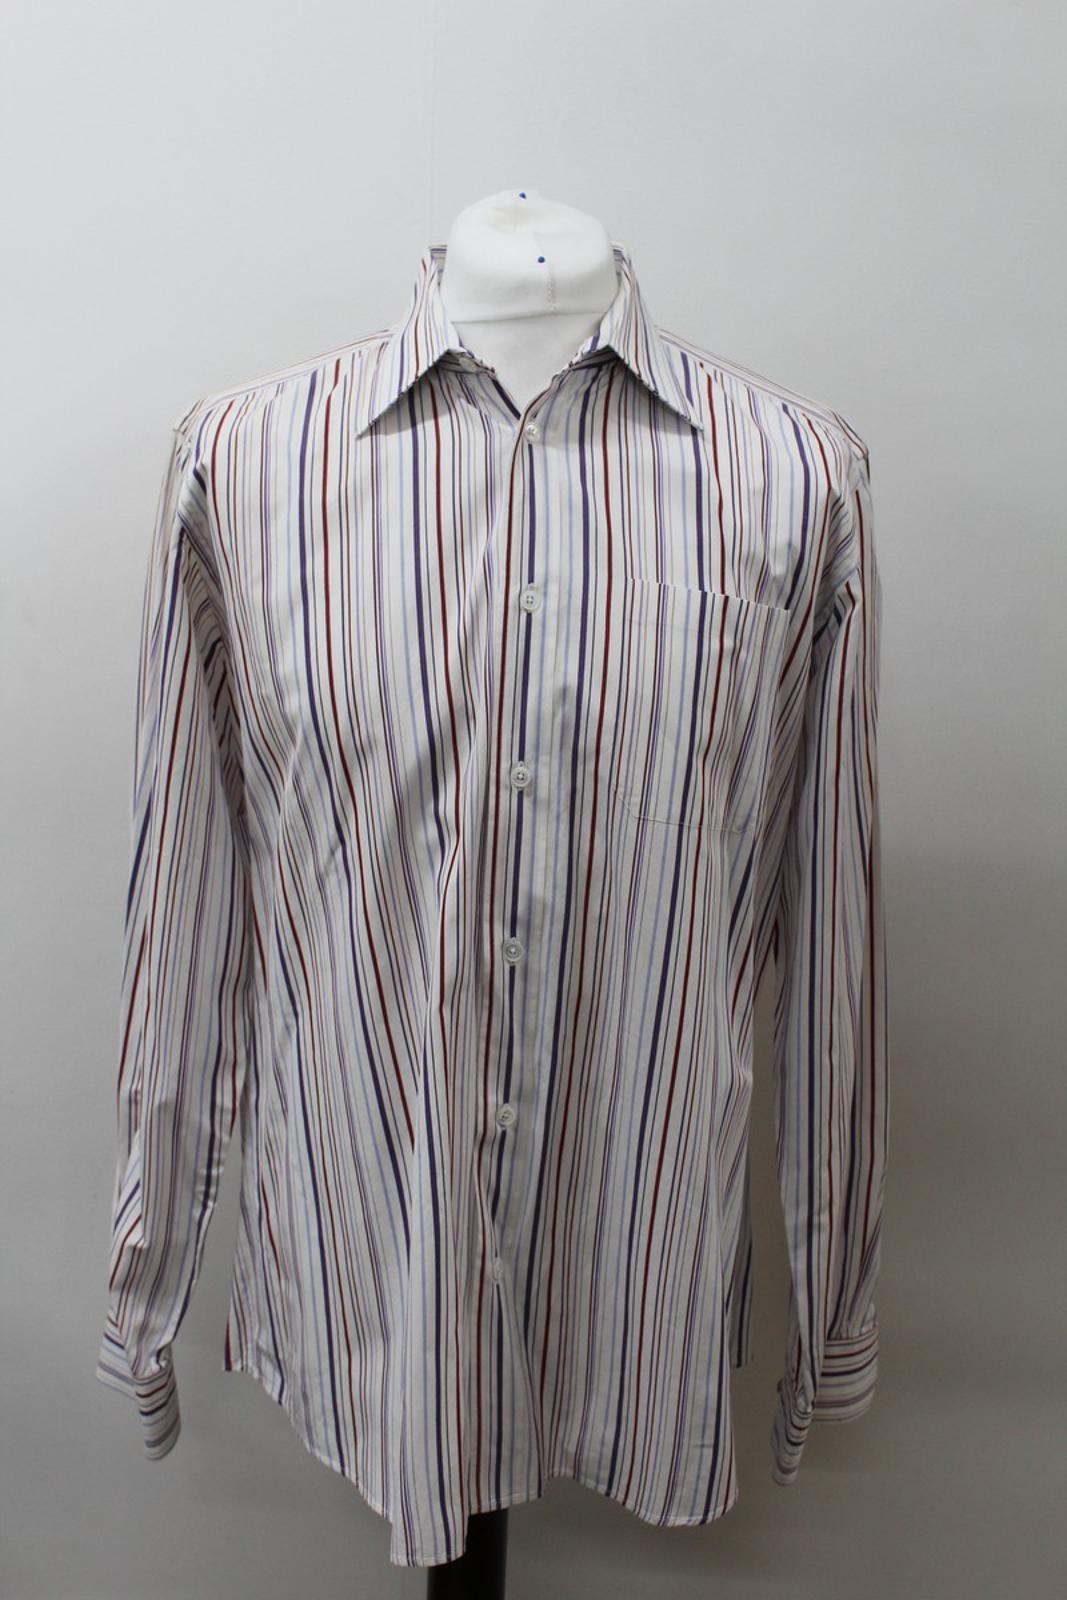 Hermes-para-hombre-Multi-Color-a-rayas-de-algodon-camisa-de-mangas-largas-cuello-16-5-034-42cm miniatura 2